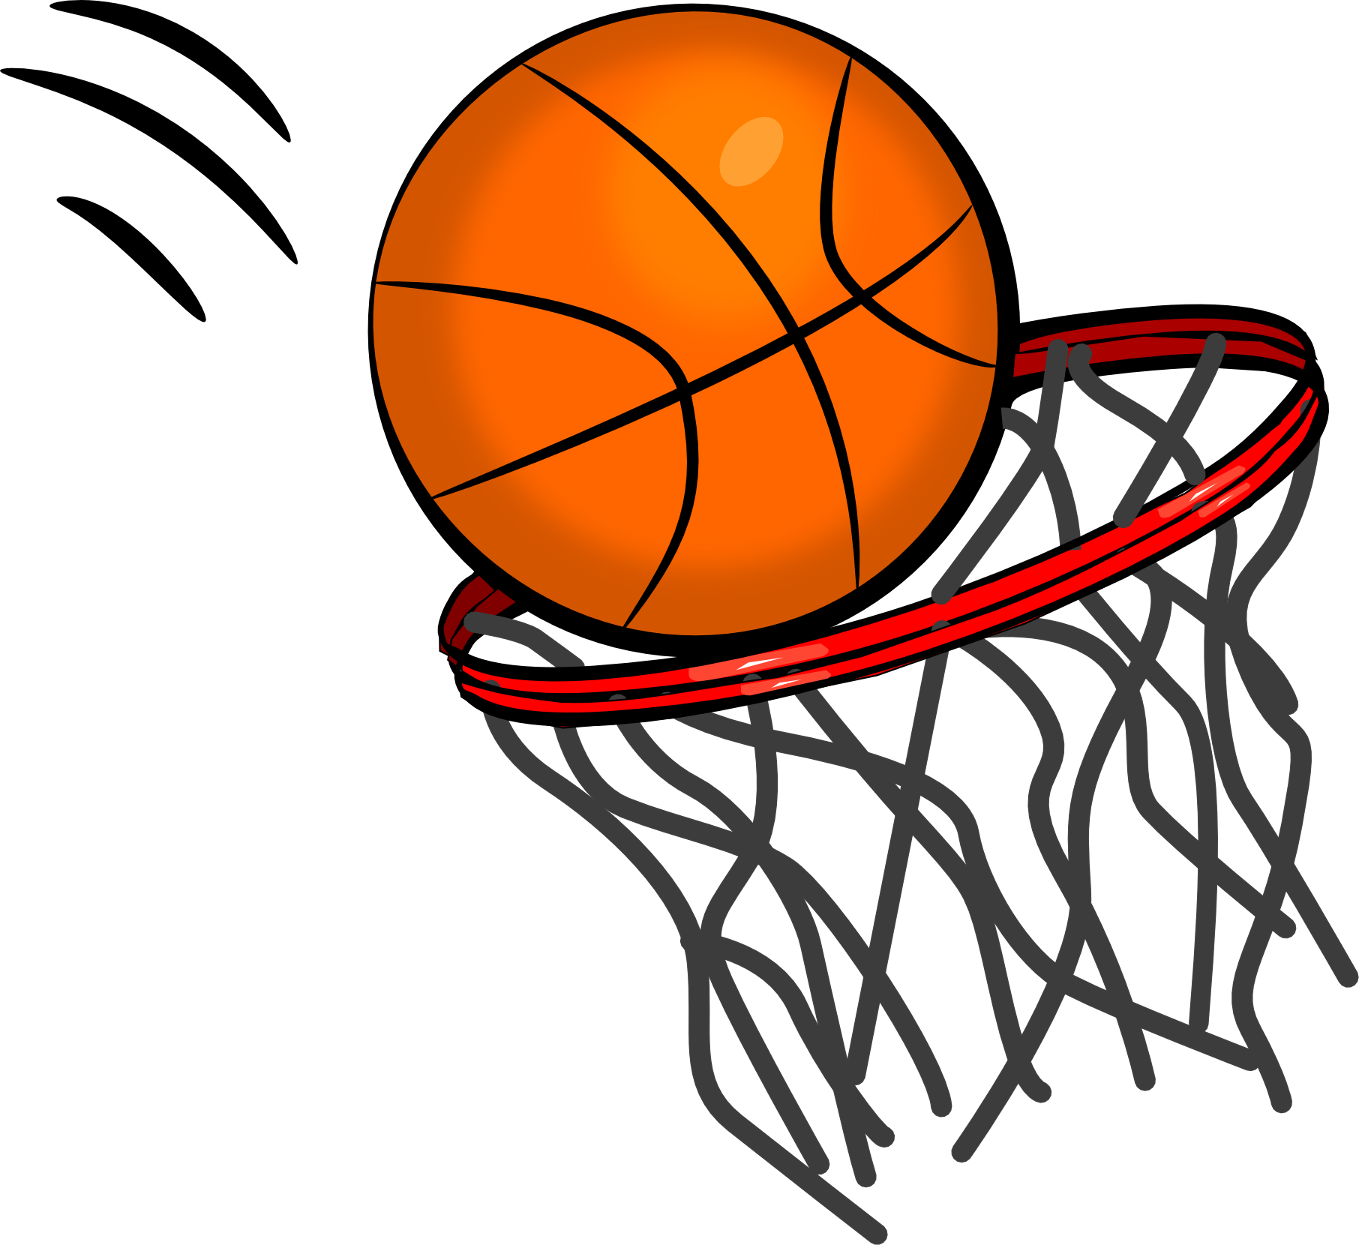 Weston Basketball Association